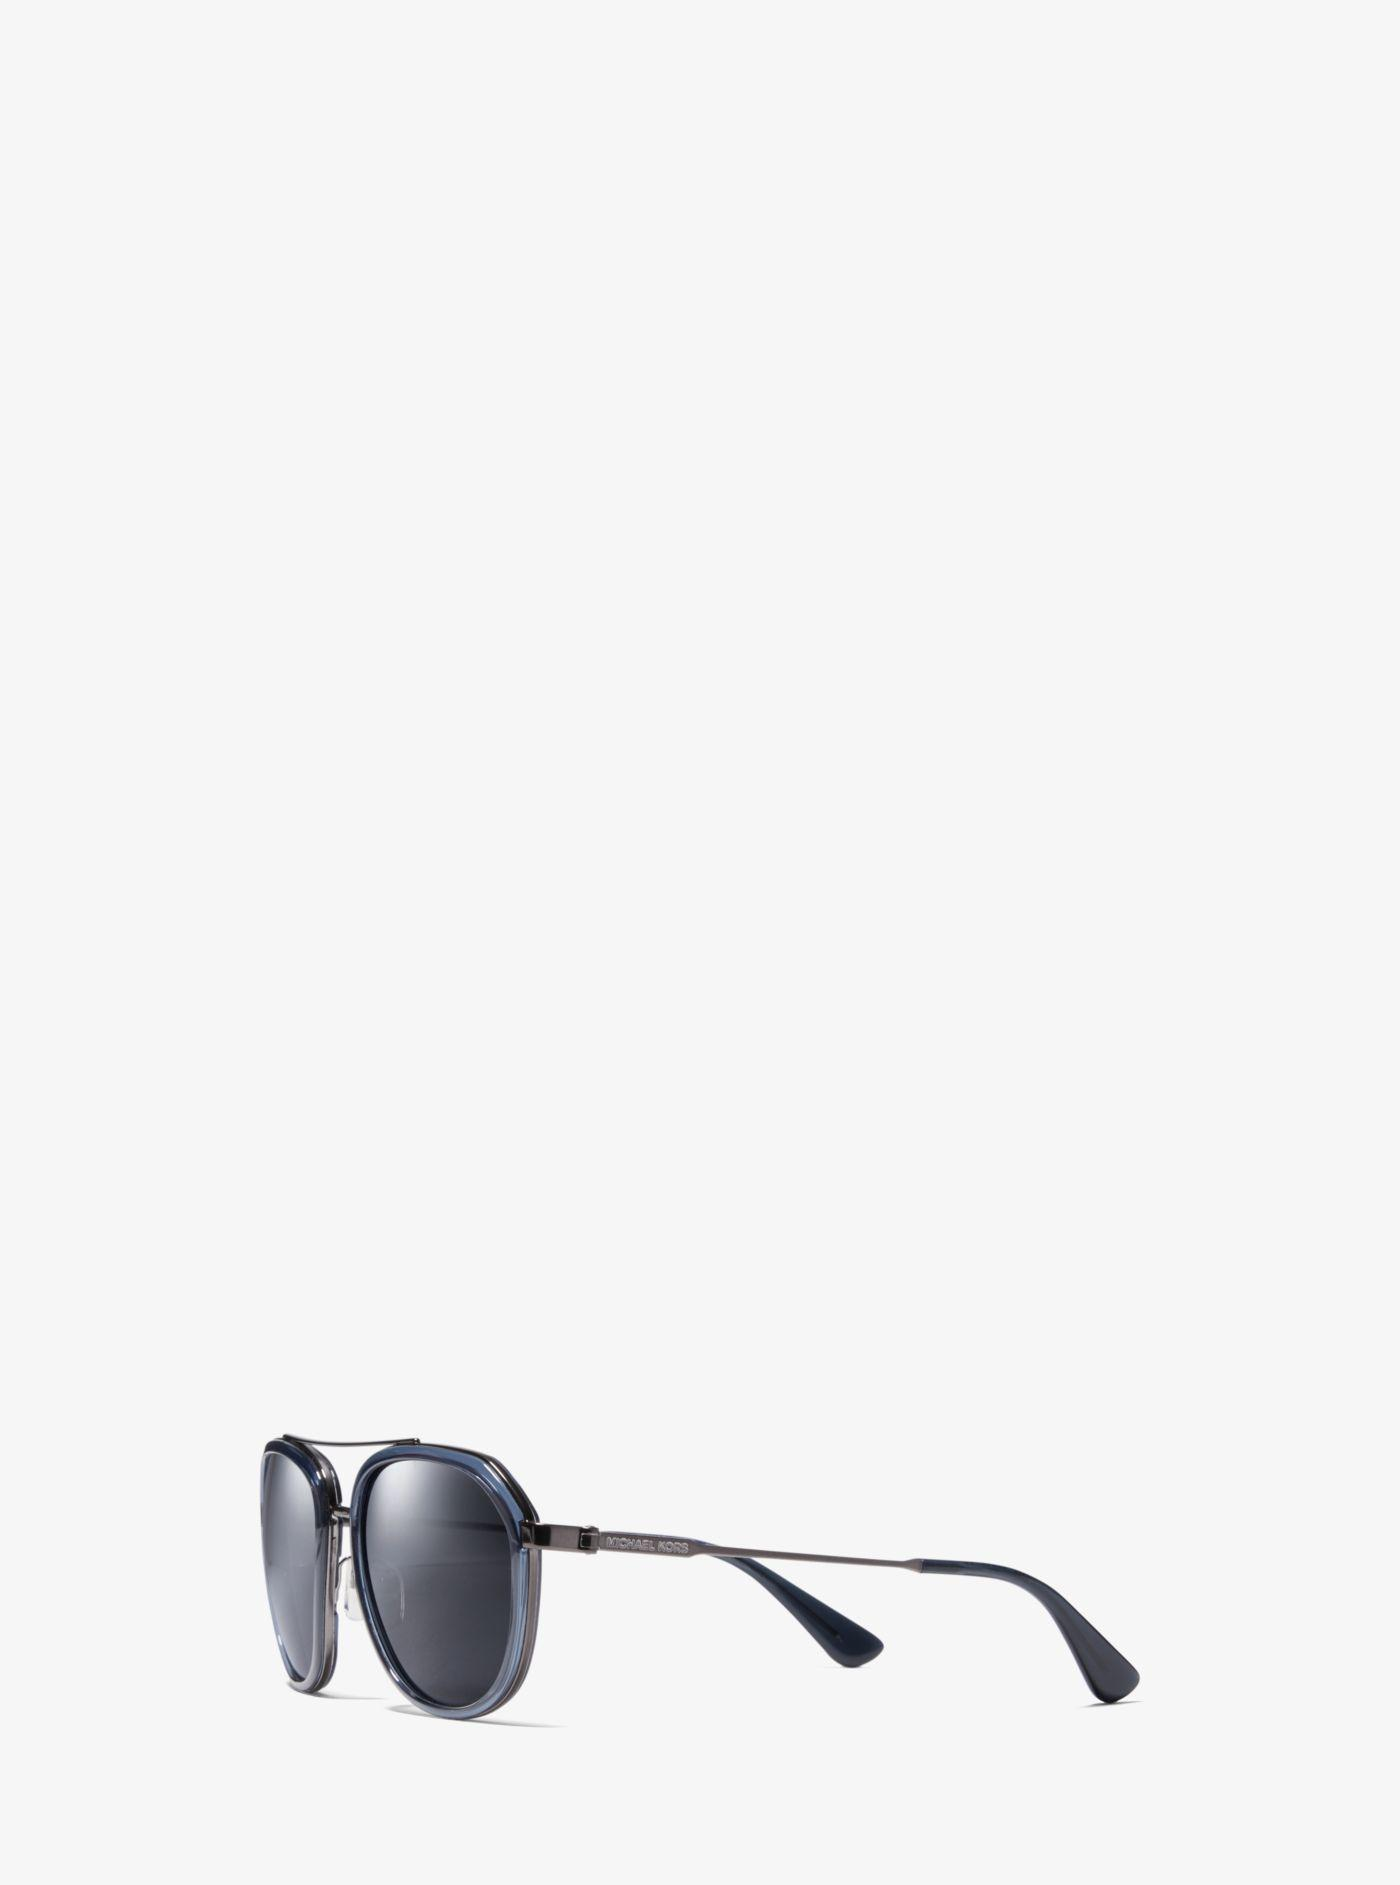 29d2e0a9d4db Michael Kors - Blue Montego Sunglasses - Lyst. View fullscreen